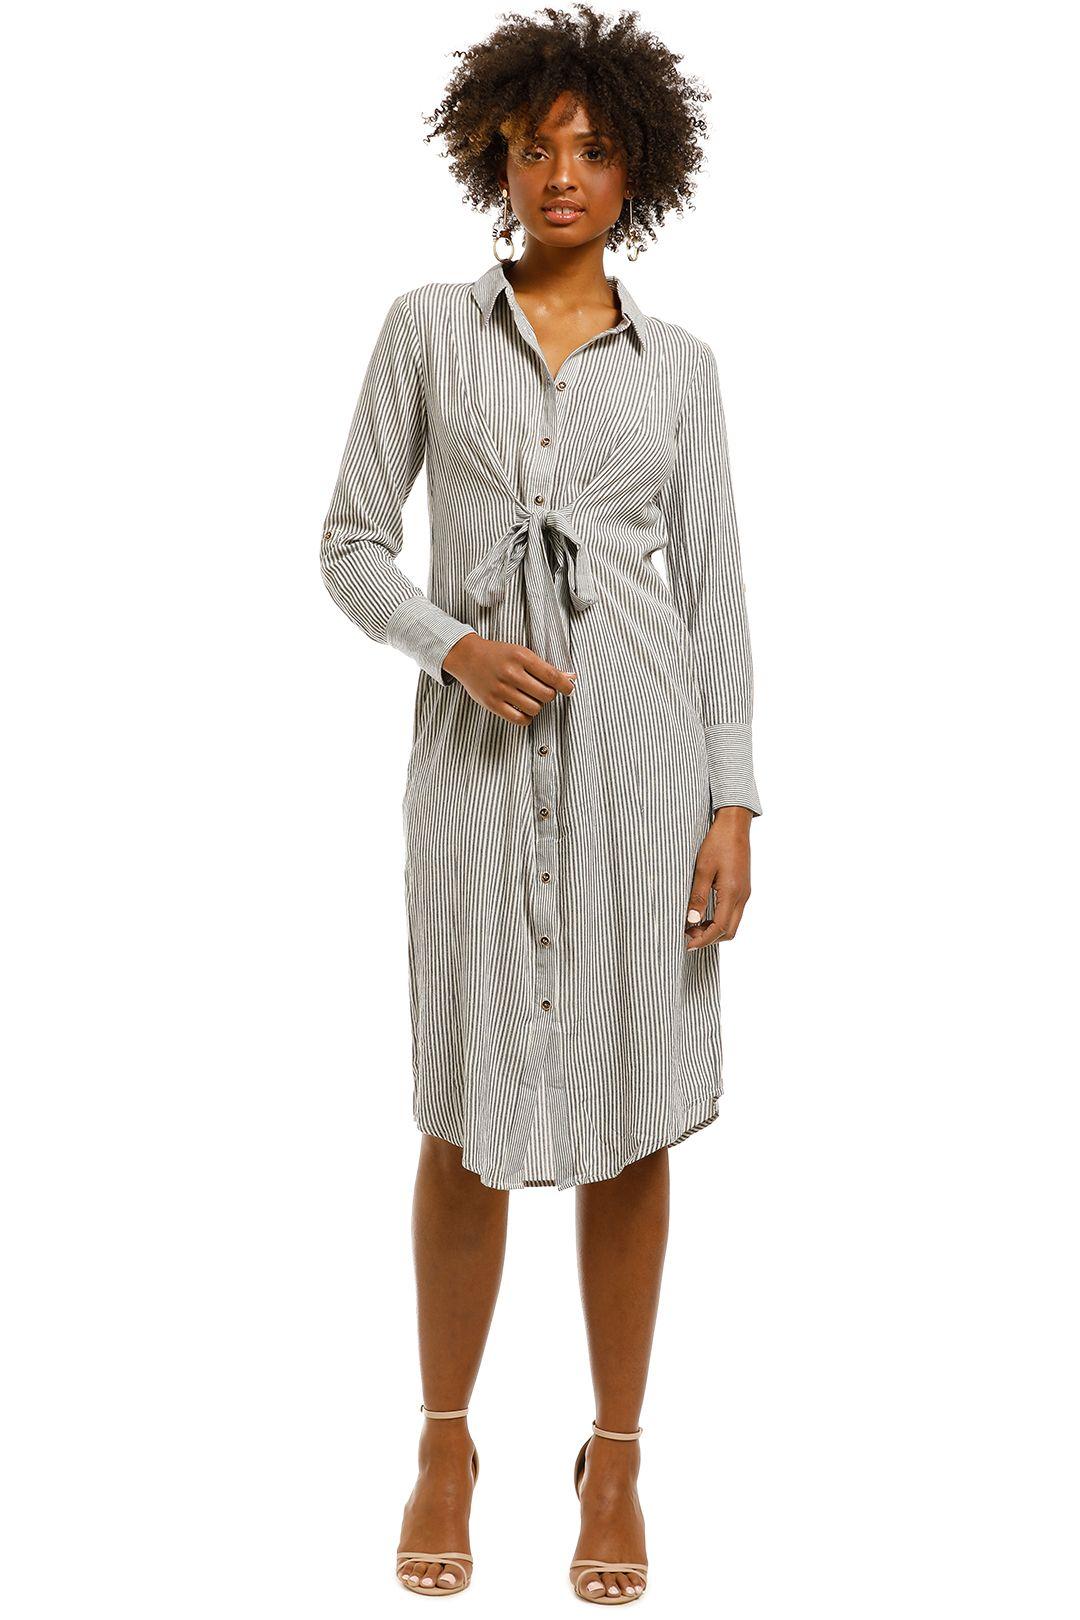 Saints-The-Label-Rowling-Dress-Navy-Stripe-Front